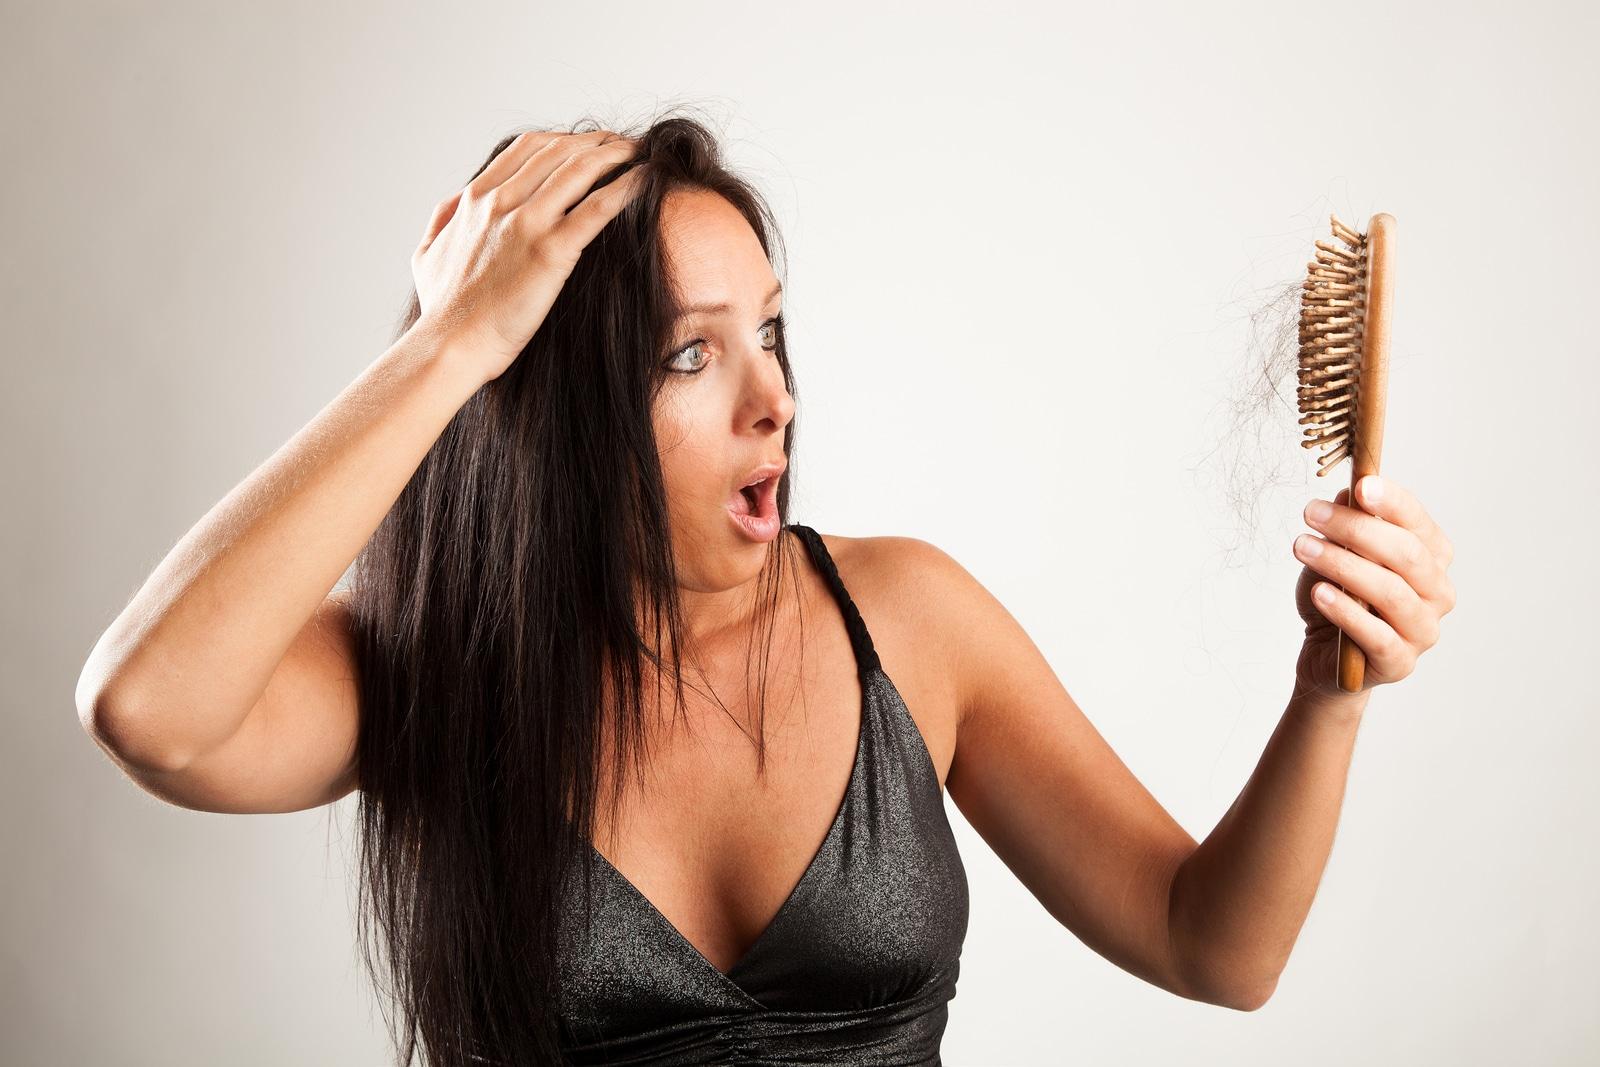 Detén la caída del cabello naturalmente